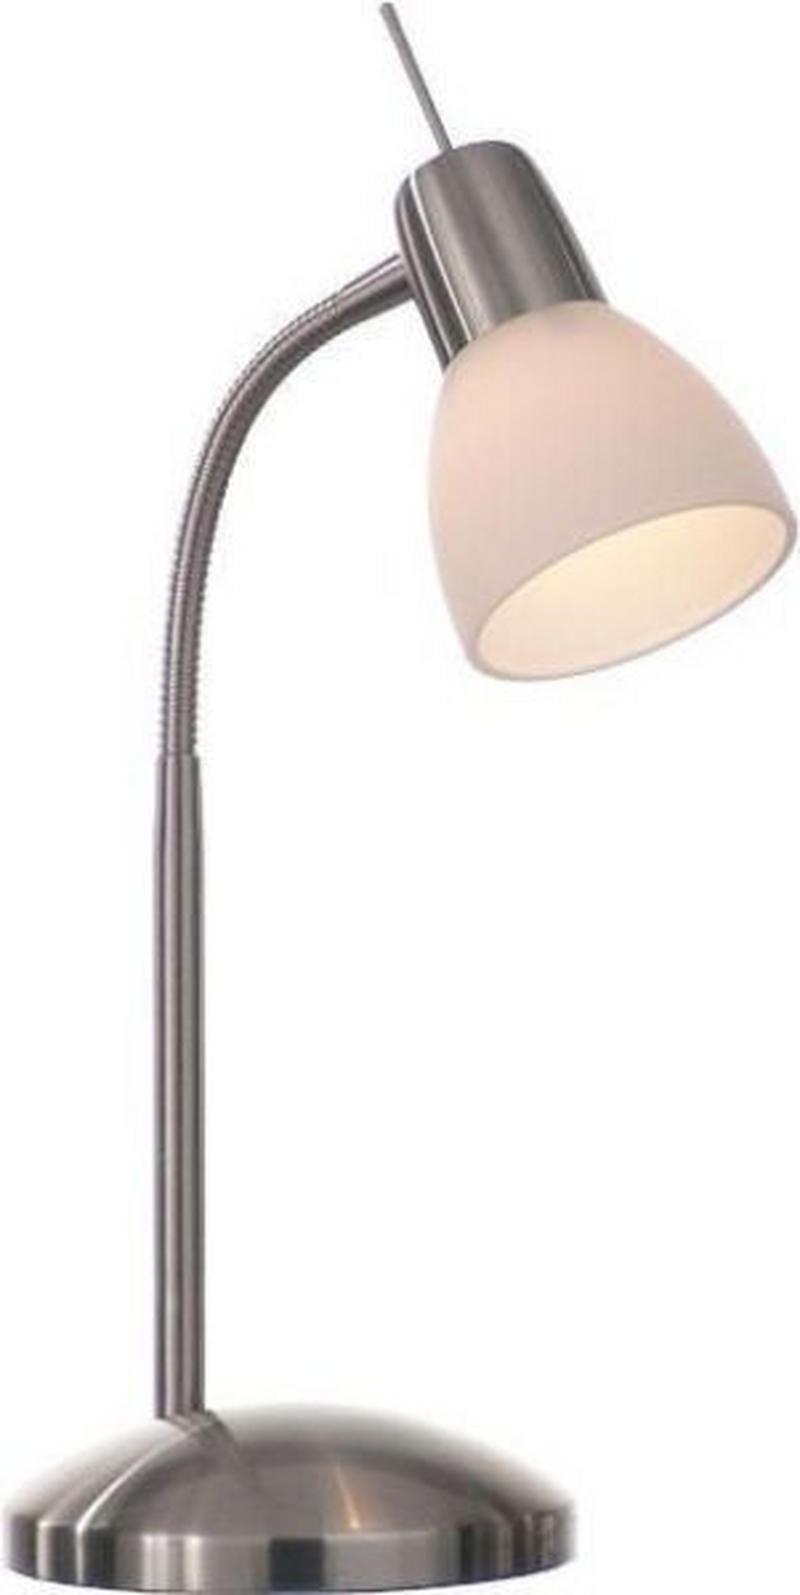 BORDSLAMPA - vit/nickelfärgad, Klassisk, metall/glas (13/40cm) - Boxxx